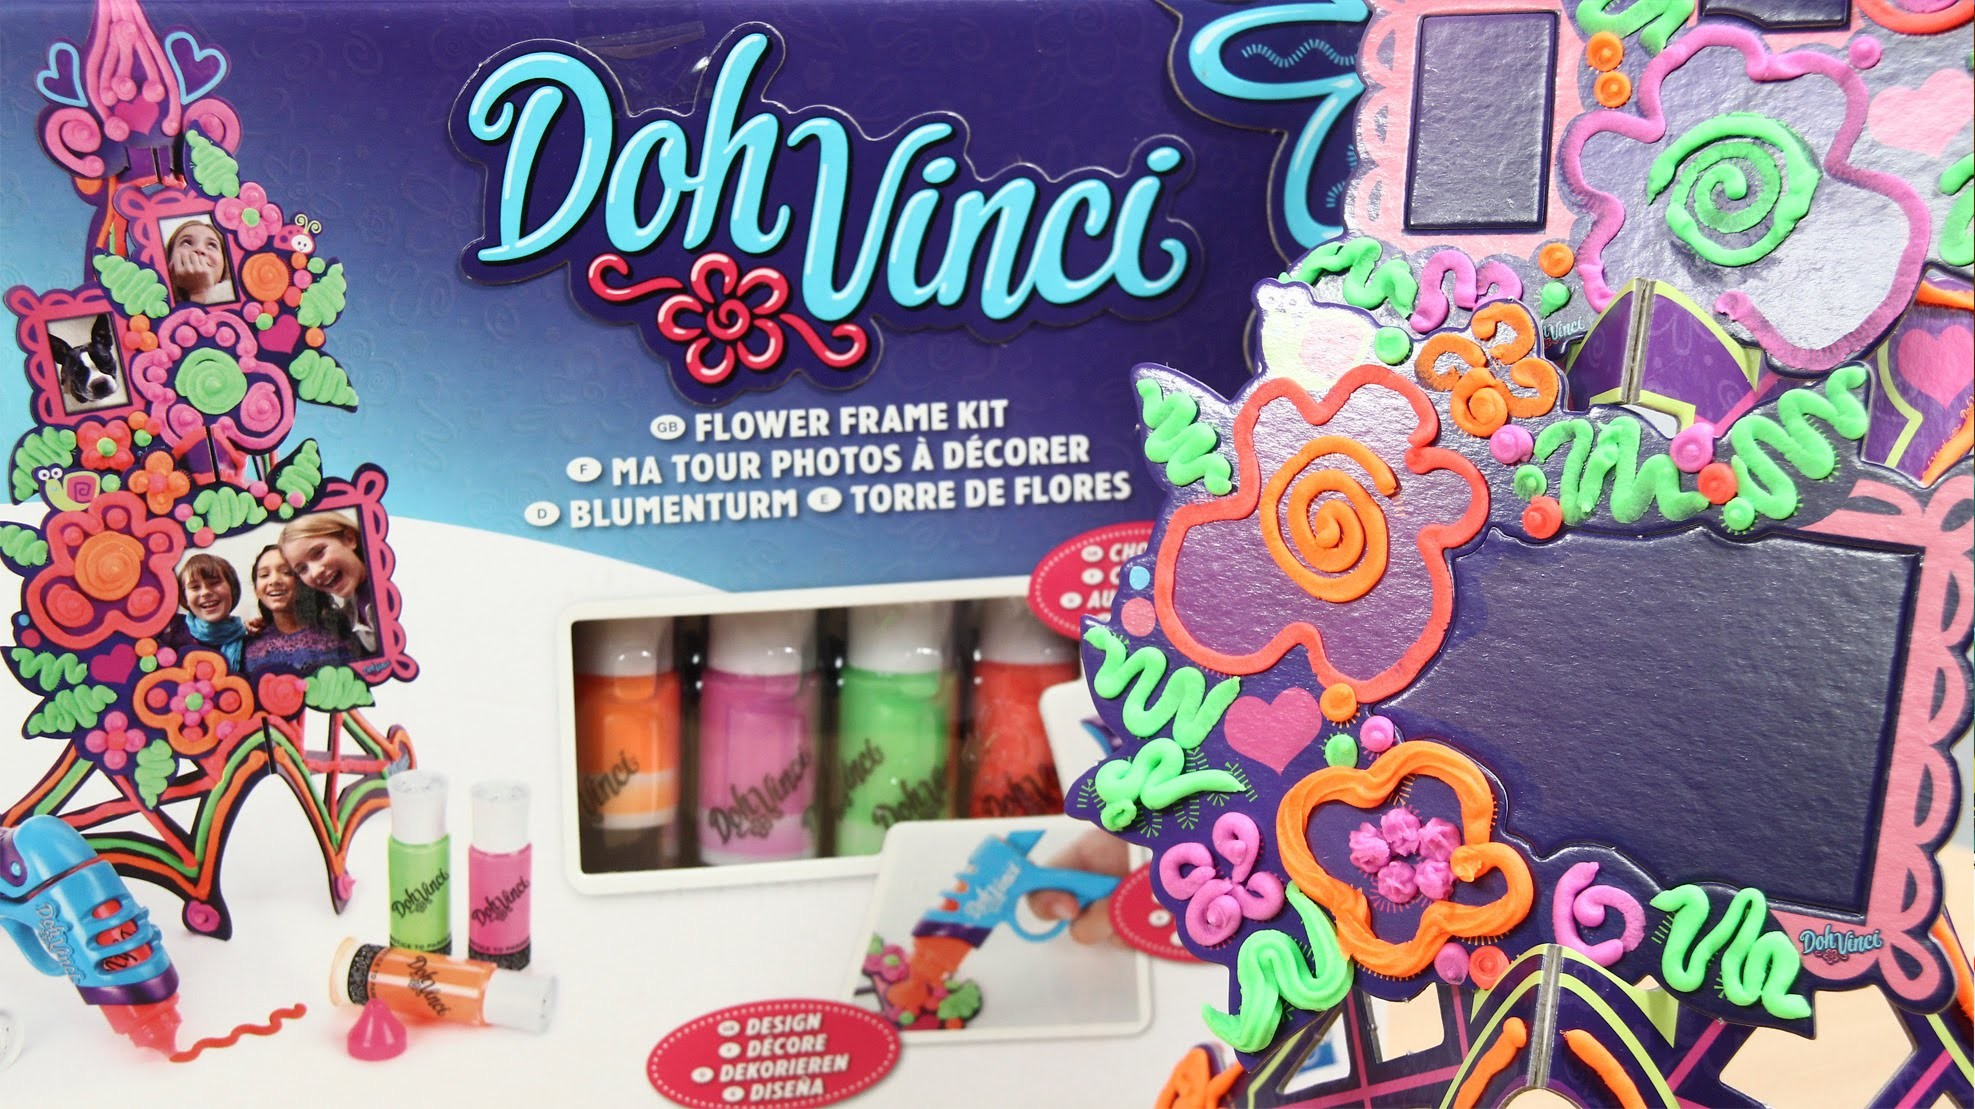 Flower Tower Picture Frame Kit. Kwiatowa Ramka do Zdjęć - Doh Vinci - Play-Doh